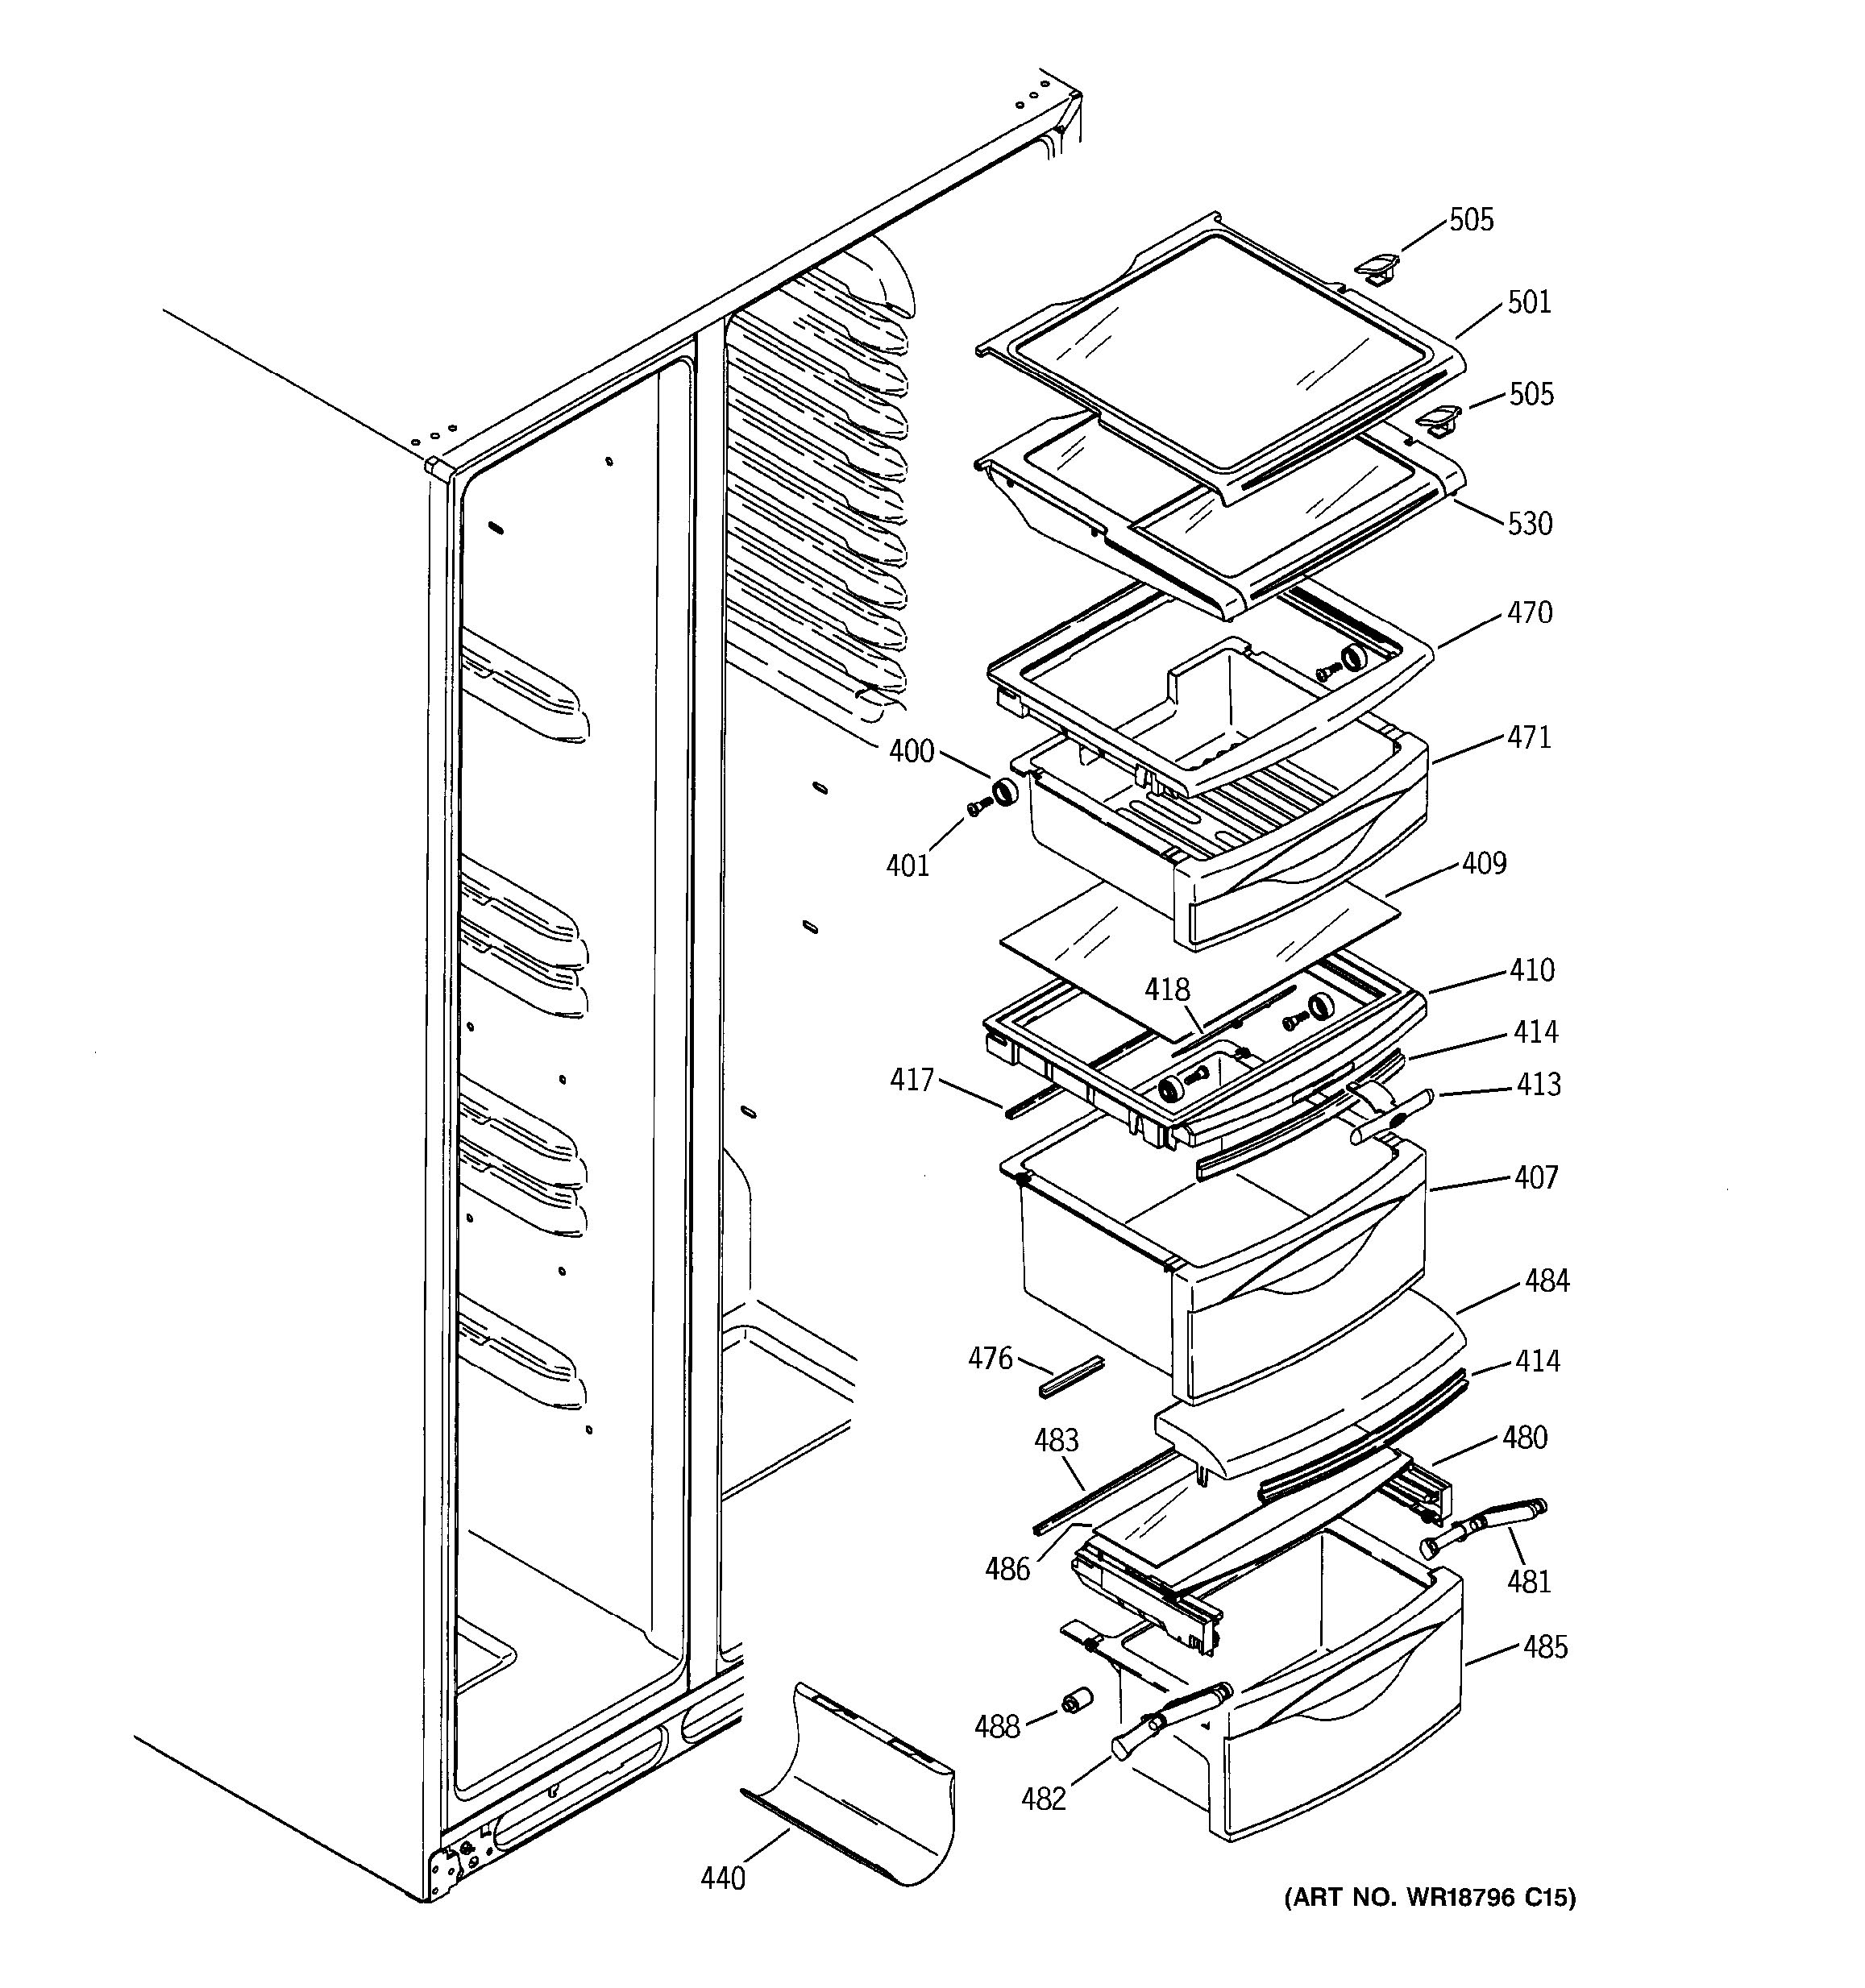 assembly view for fresh food shelves psc23mgnabb. Black Bedroom Furniture Sets. Home Design Ideas